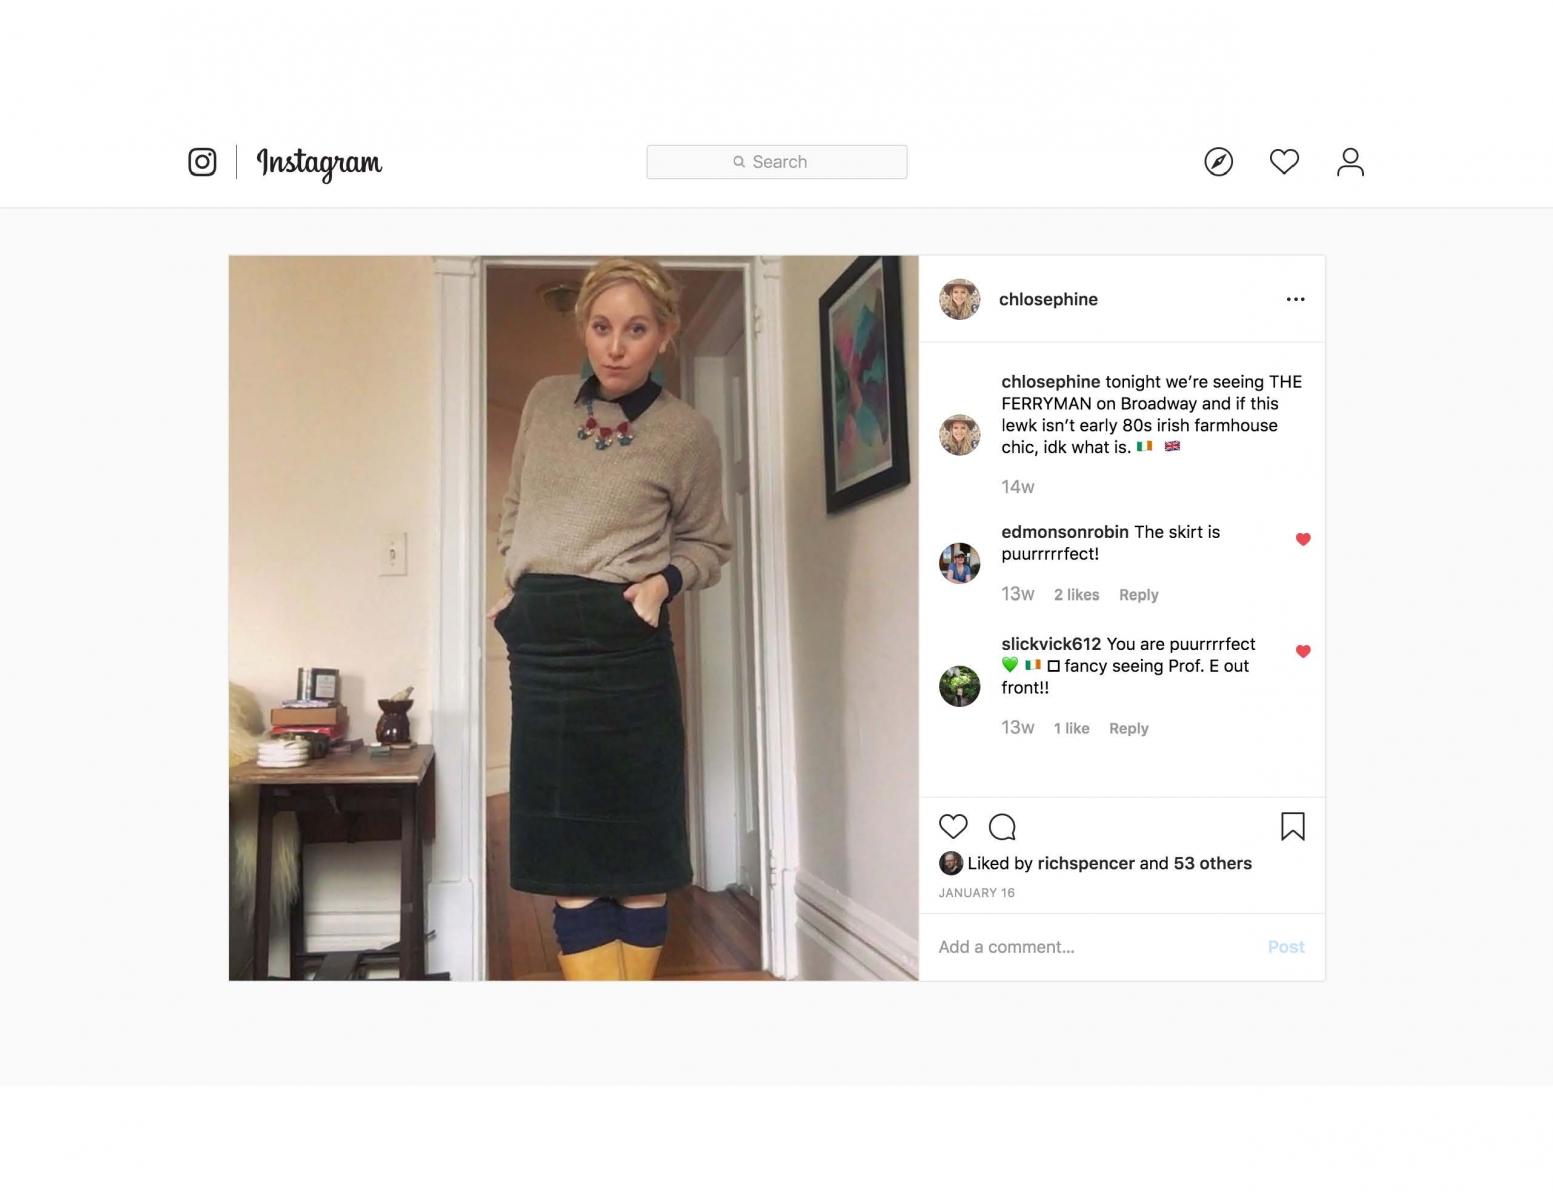 EDMONSON-Instagram-Pedagogy_Page_13